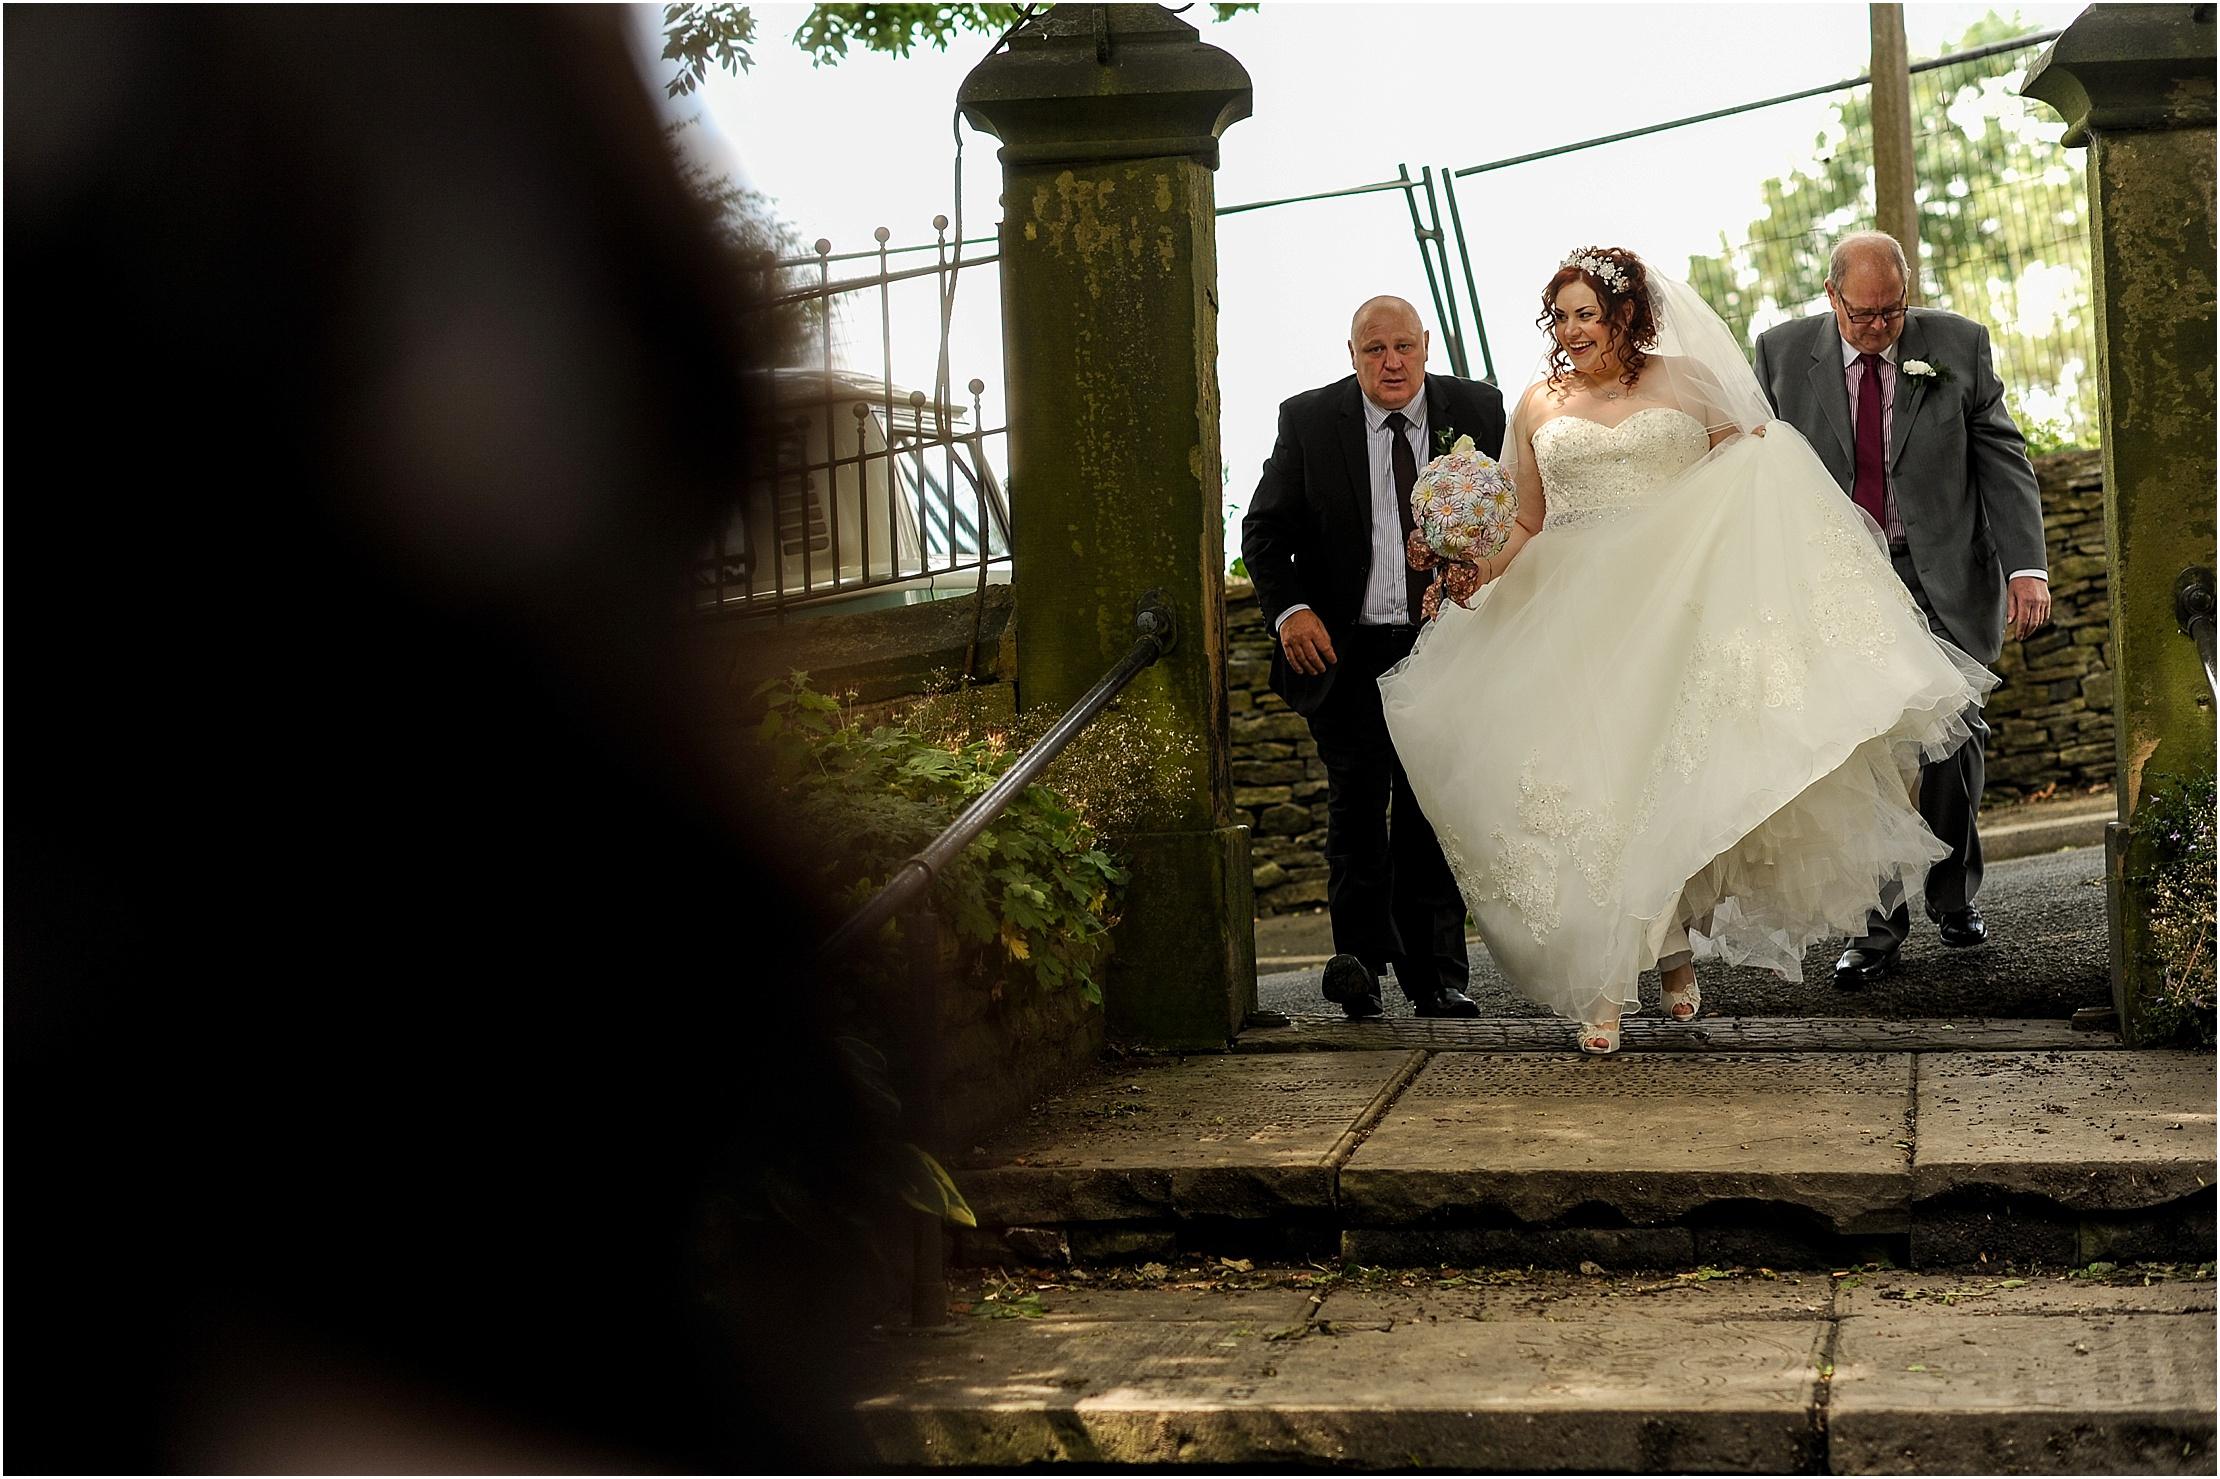 shireburn-arms-wedding- 044.jpg